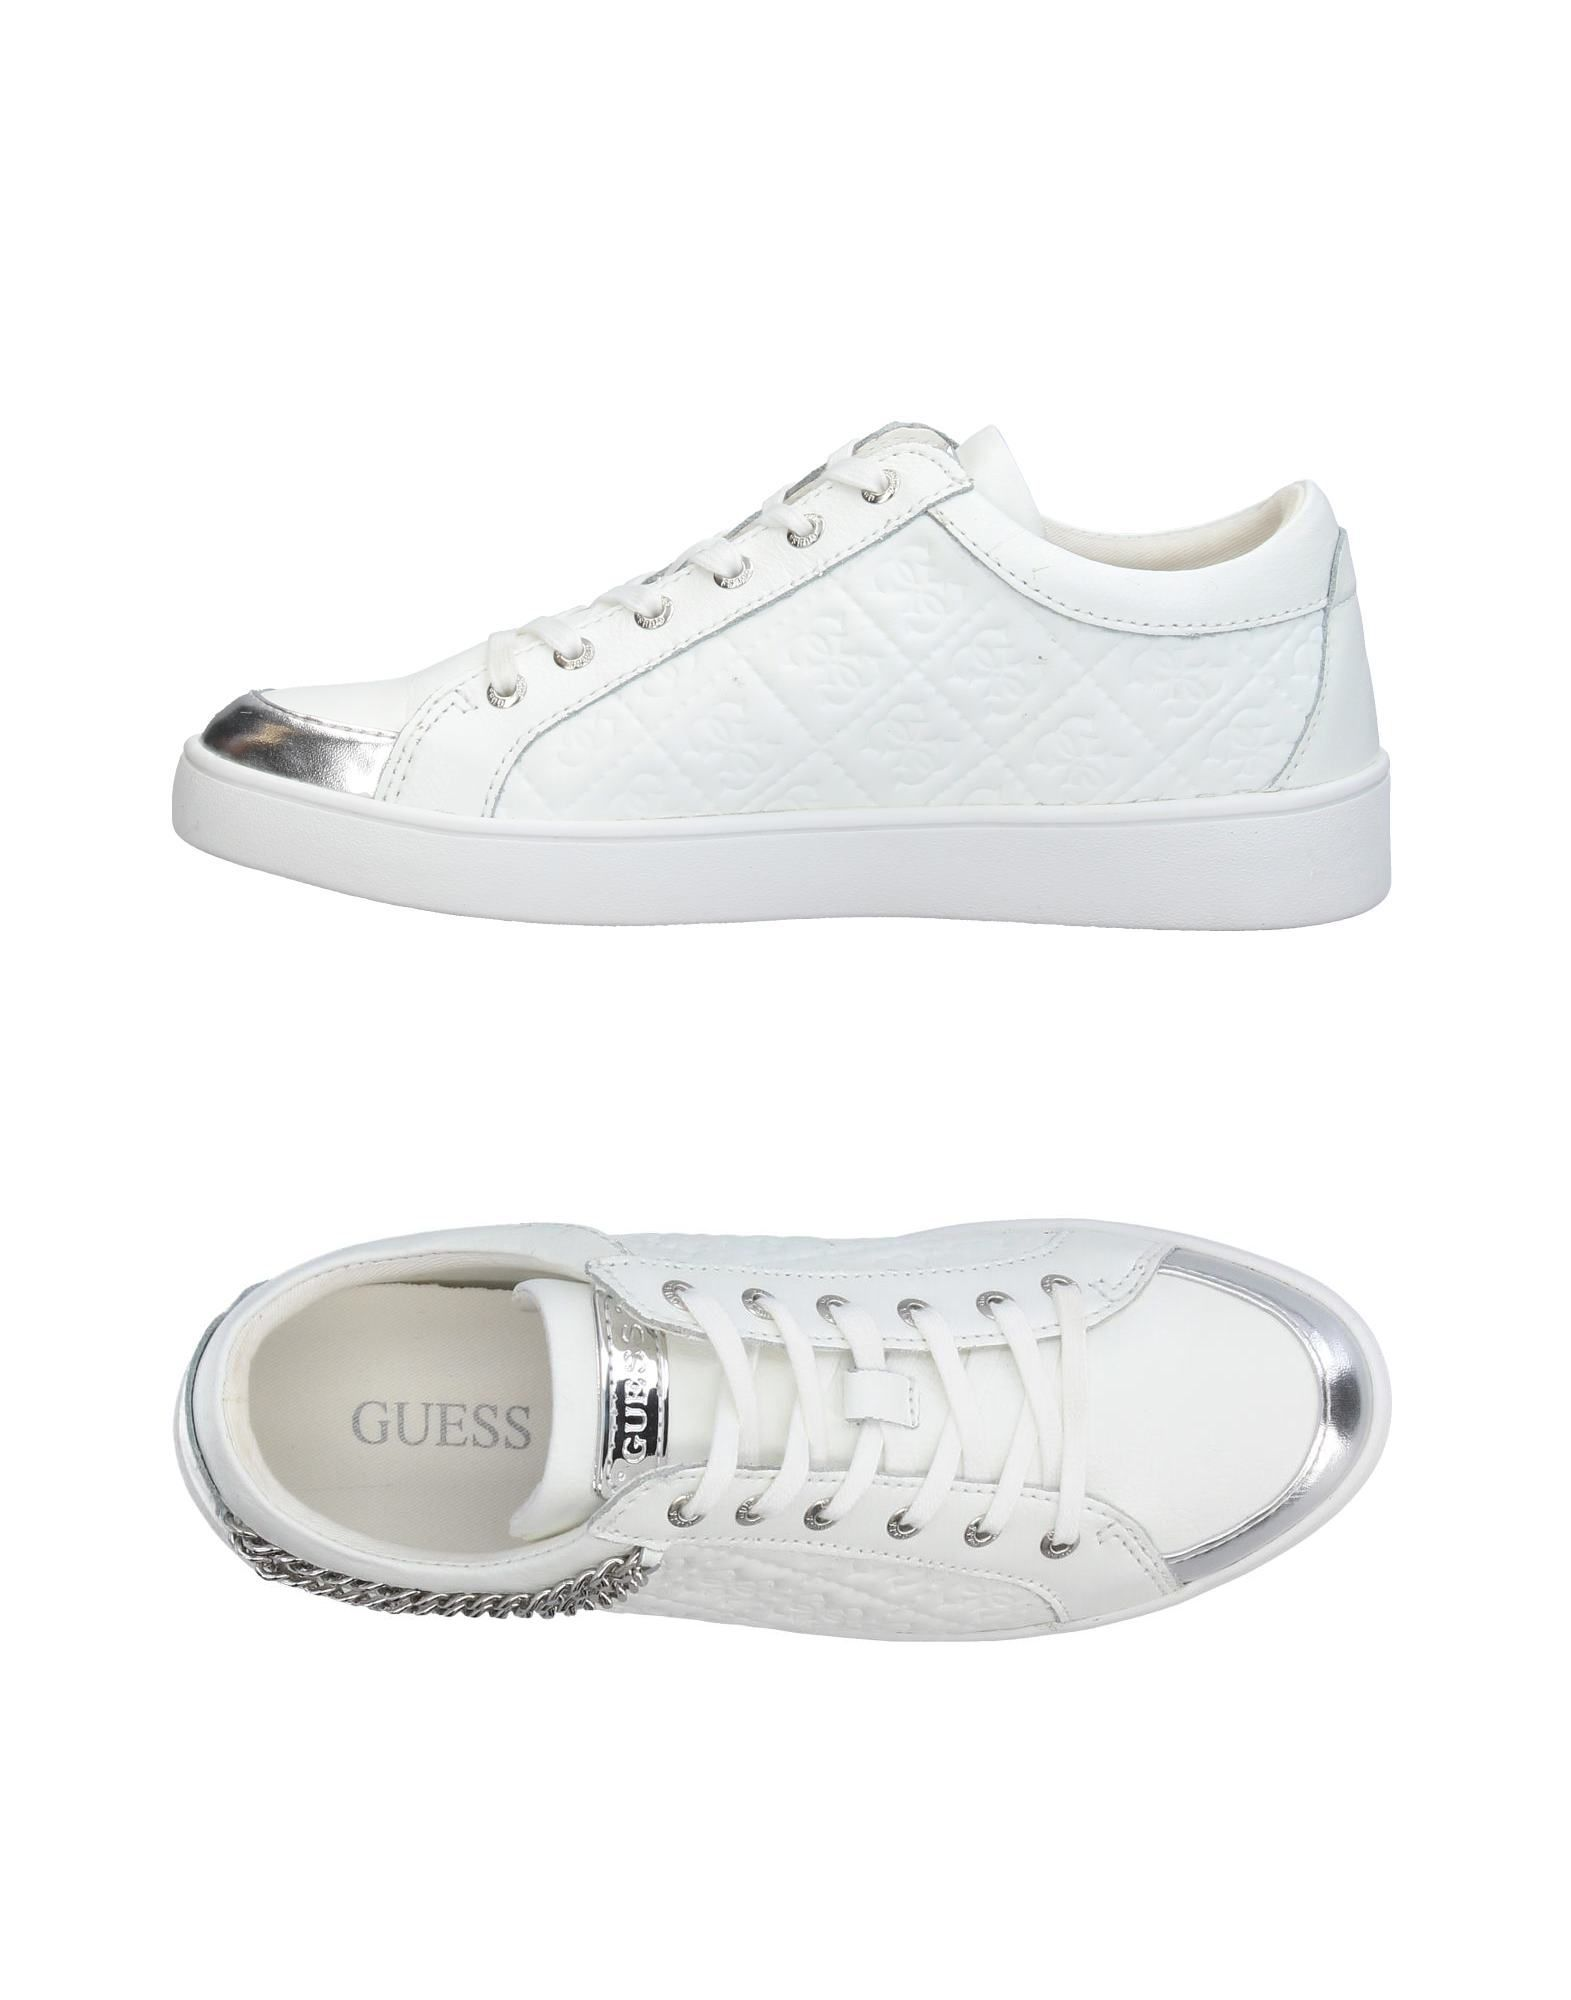 A buon mercato Sneakers Guess Donna - 11397363LU